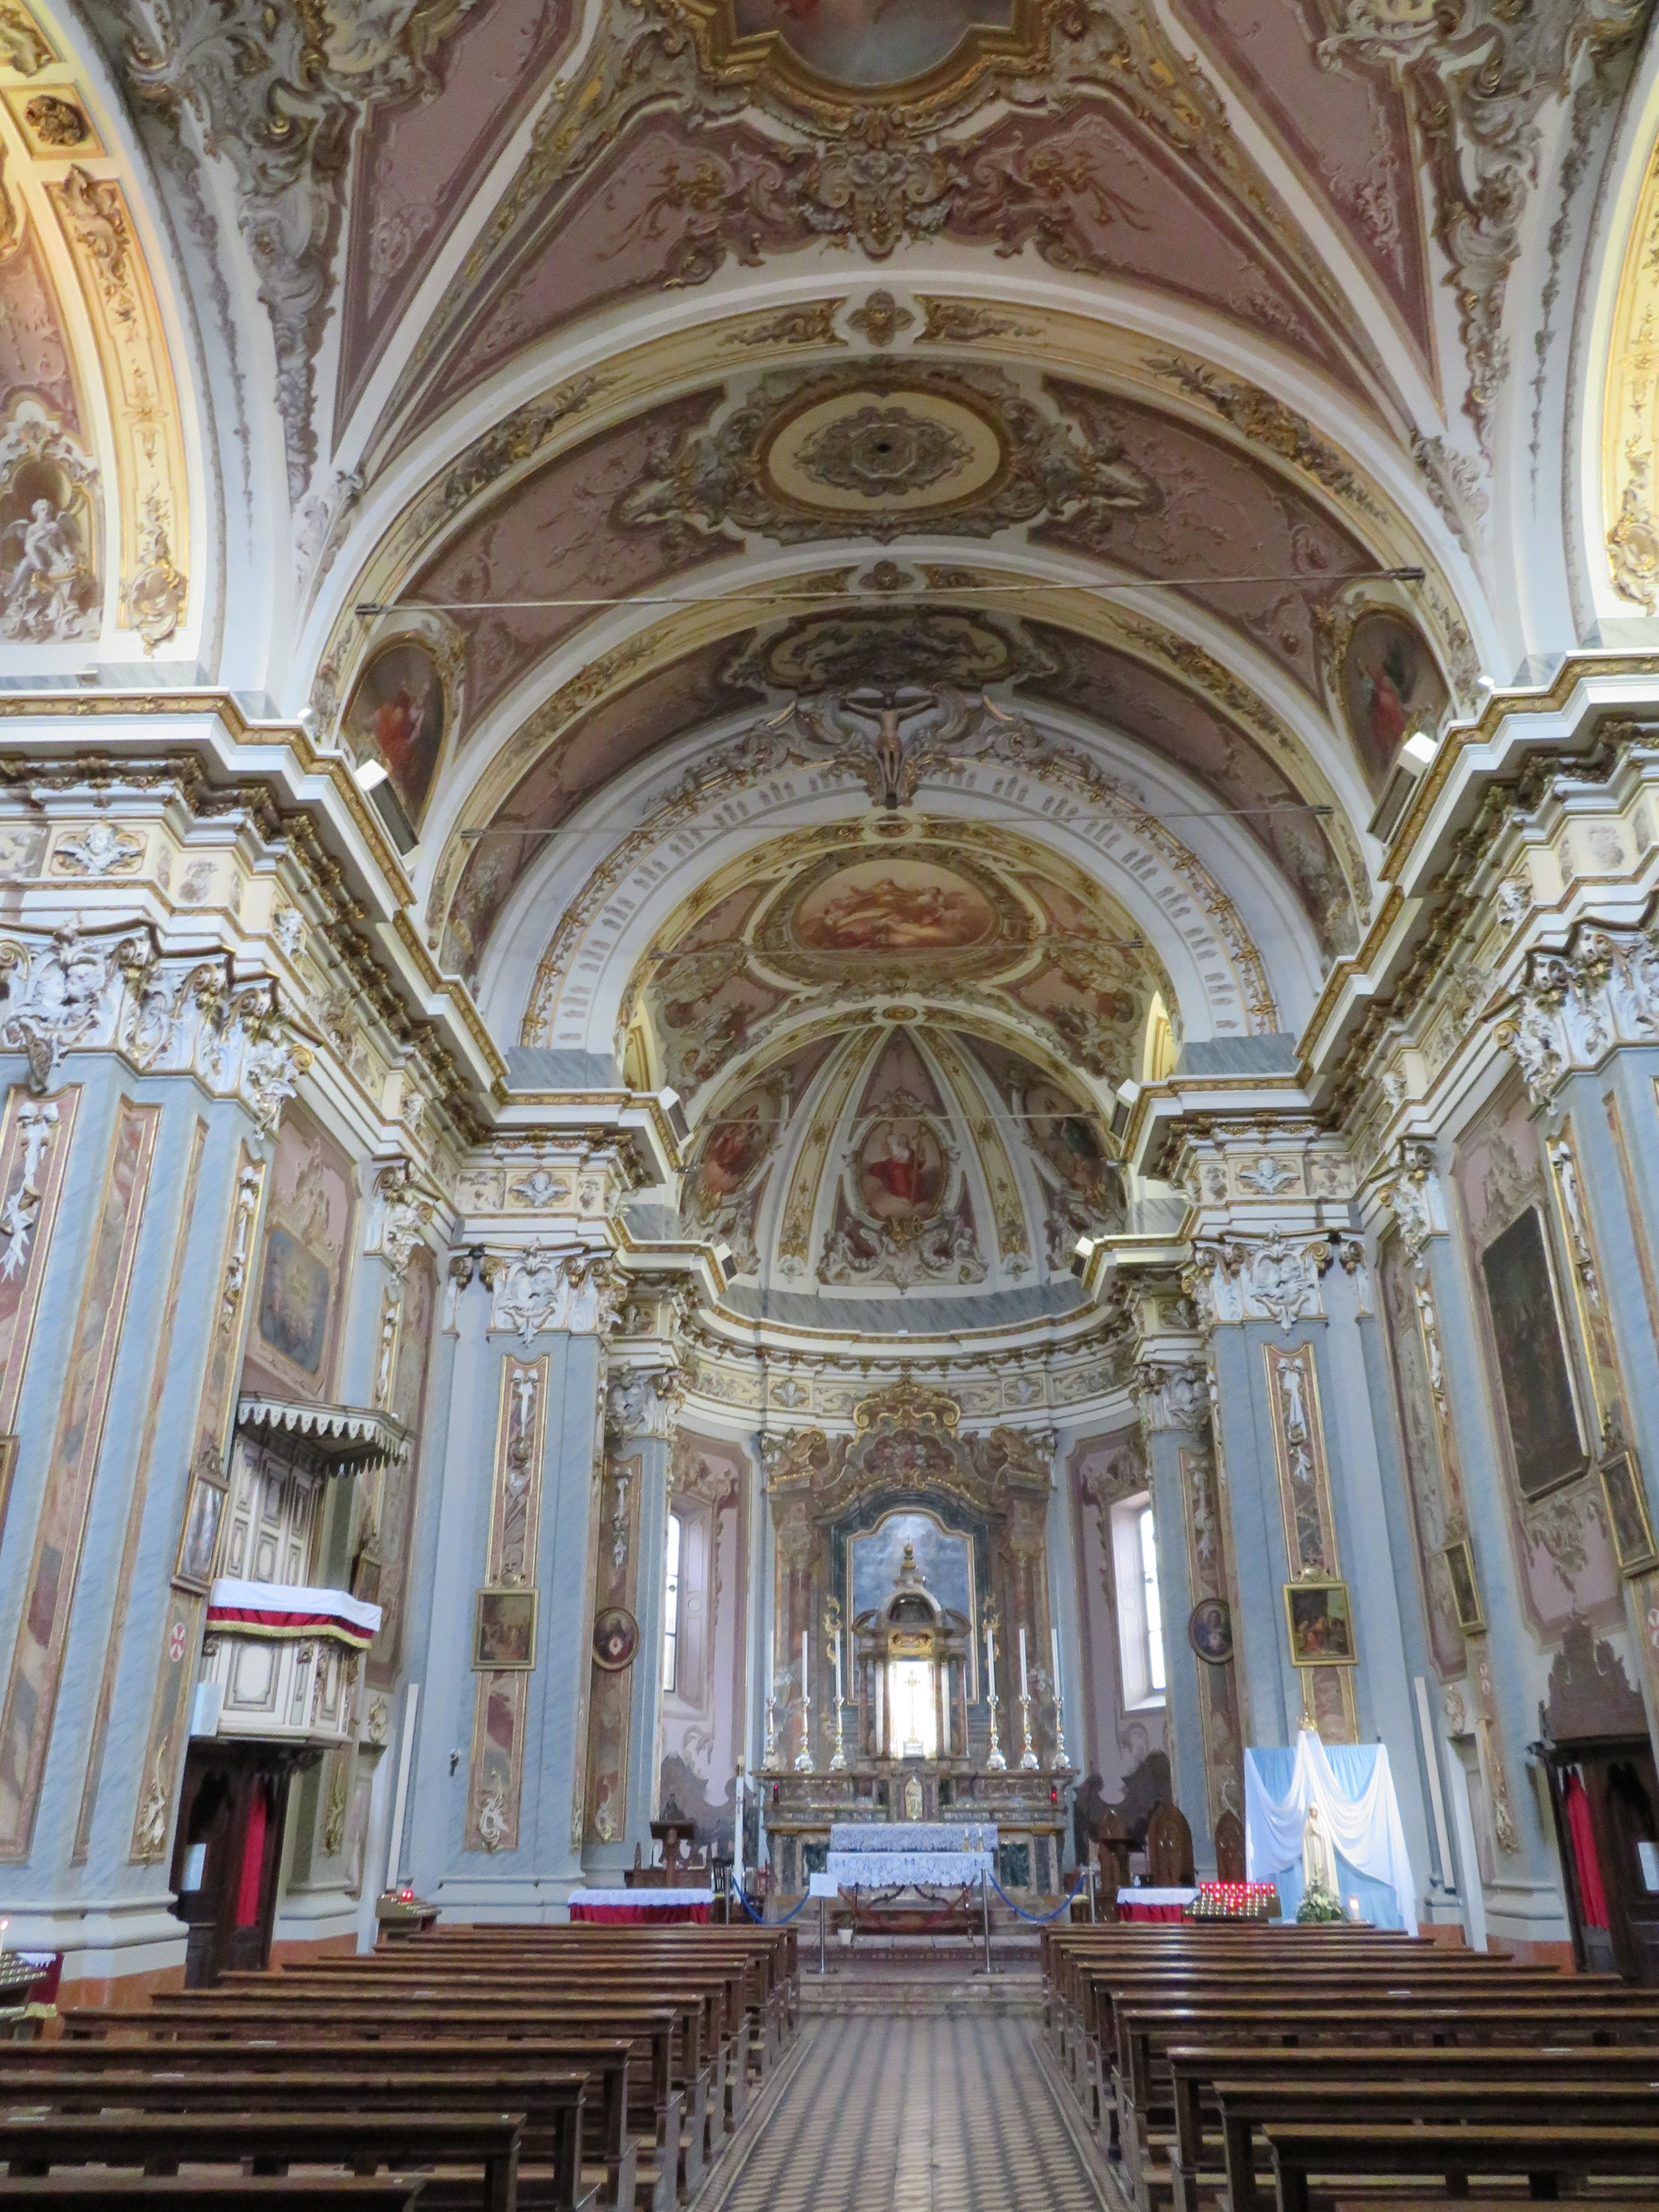 Orio-Santa Cristina_church inside.JPG